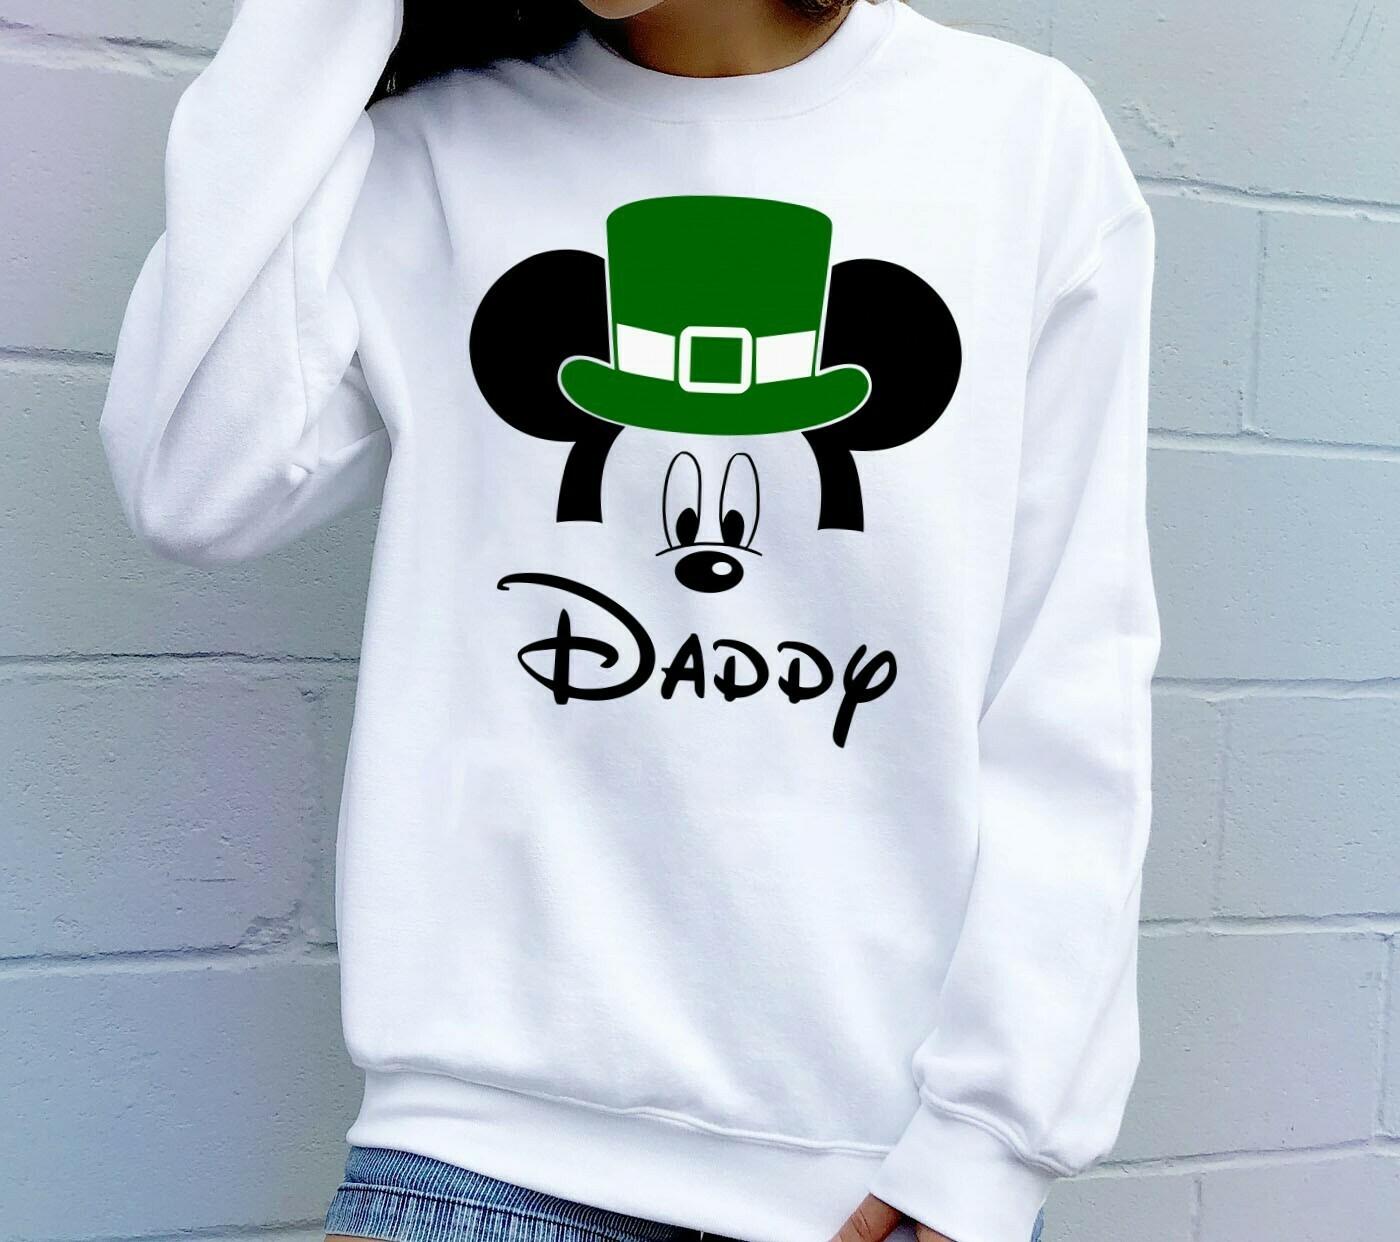 St Patrick's Day Daddy Mickey Disney Inspired,Green Leprechaun Shamrock Lucky charm of the Irish Disneyland  T-Shirt Hoodie Sweatshirt Sweater Tee Kids Youth Gifts Jolly Family Gifts